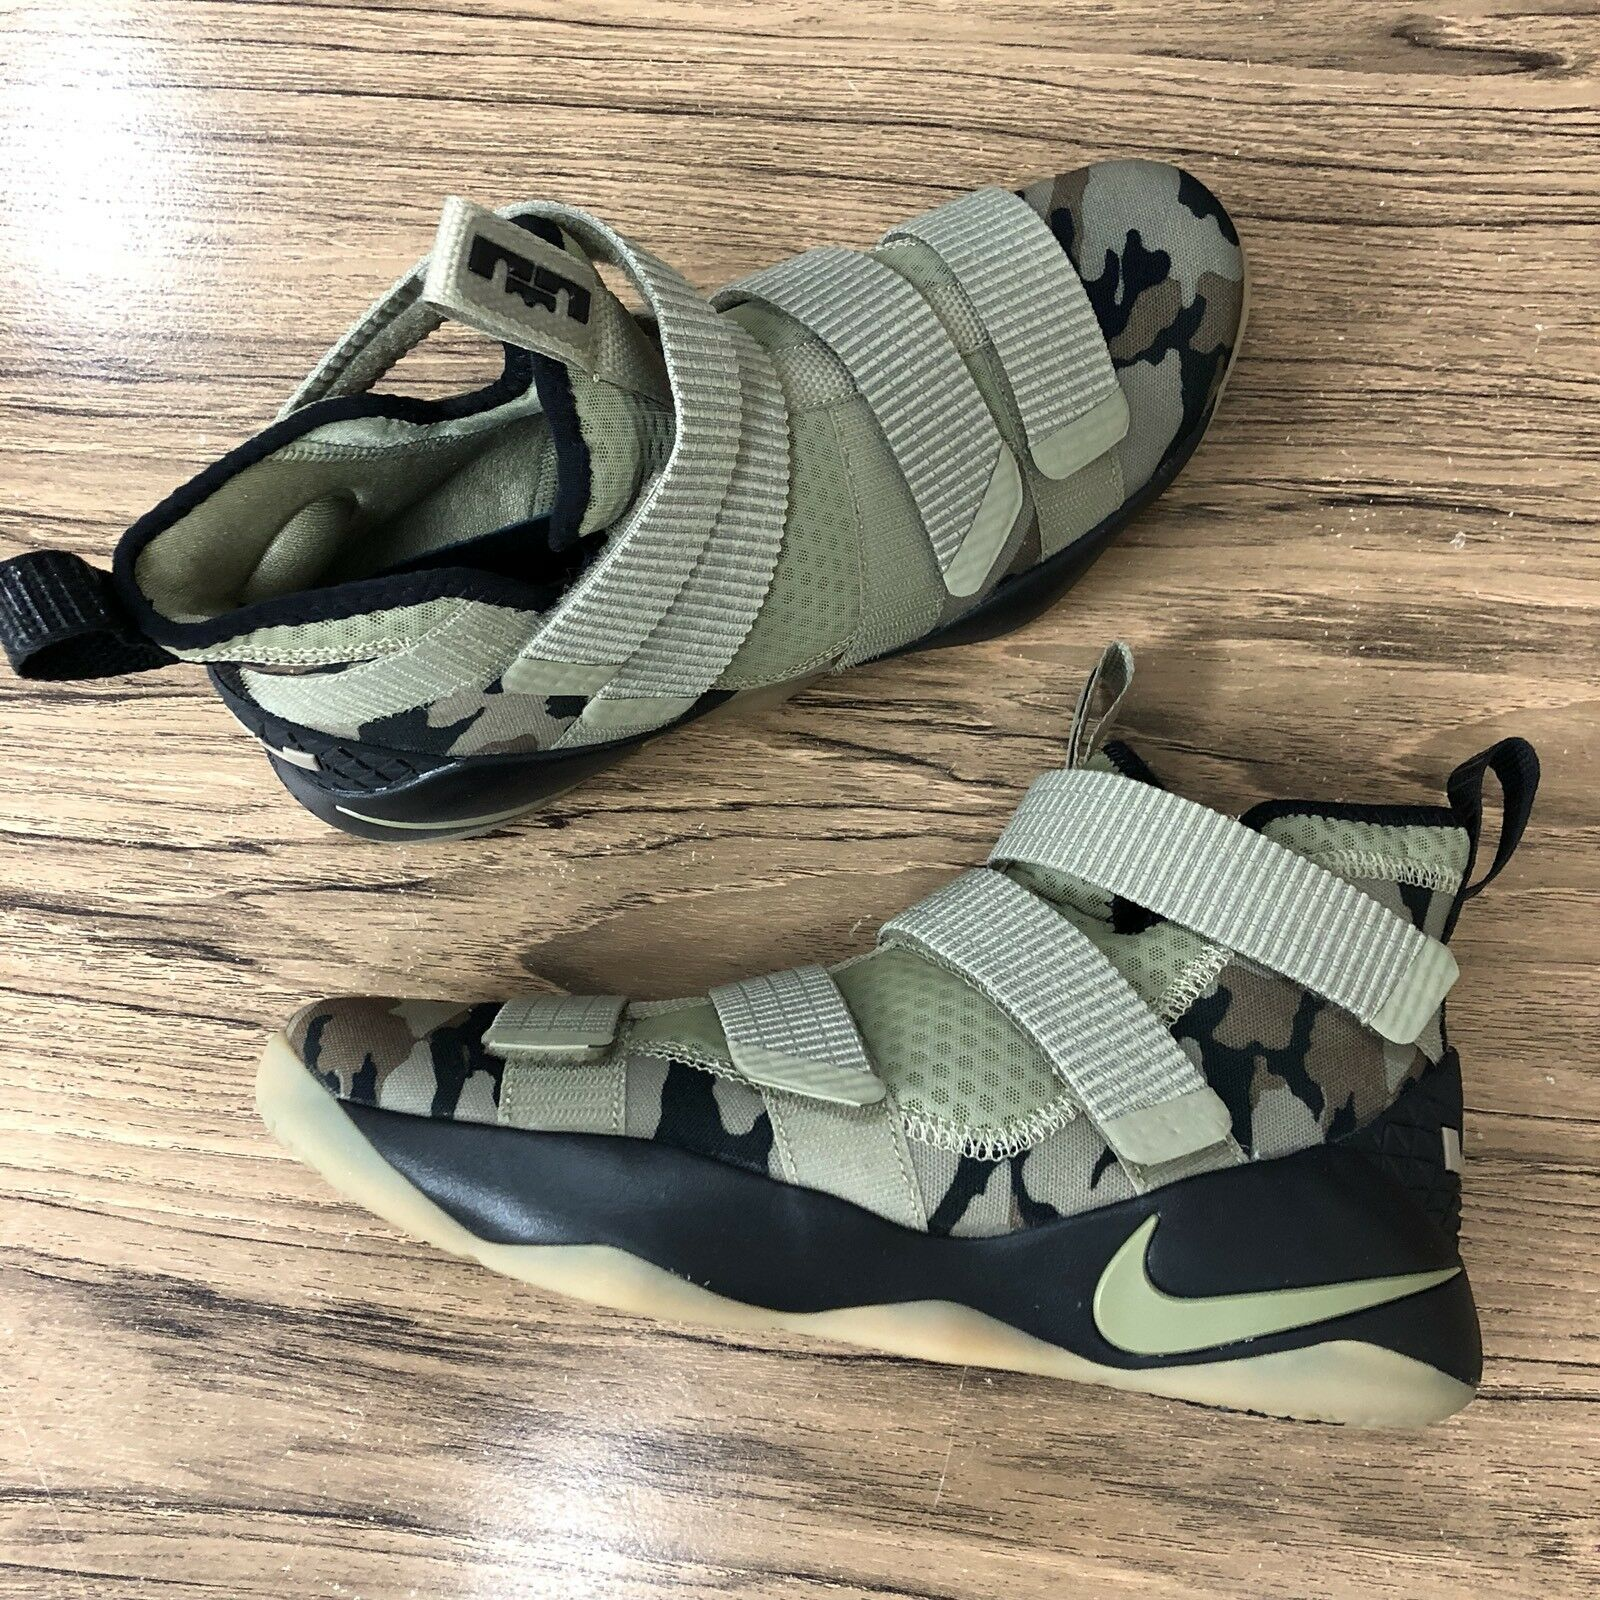 A690 nike lebron soldato xi 897644-200 Uomo basket scarpe taglia 12 nuovi